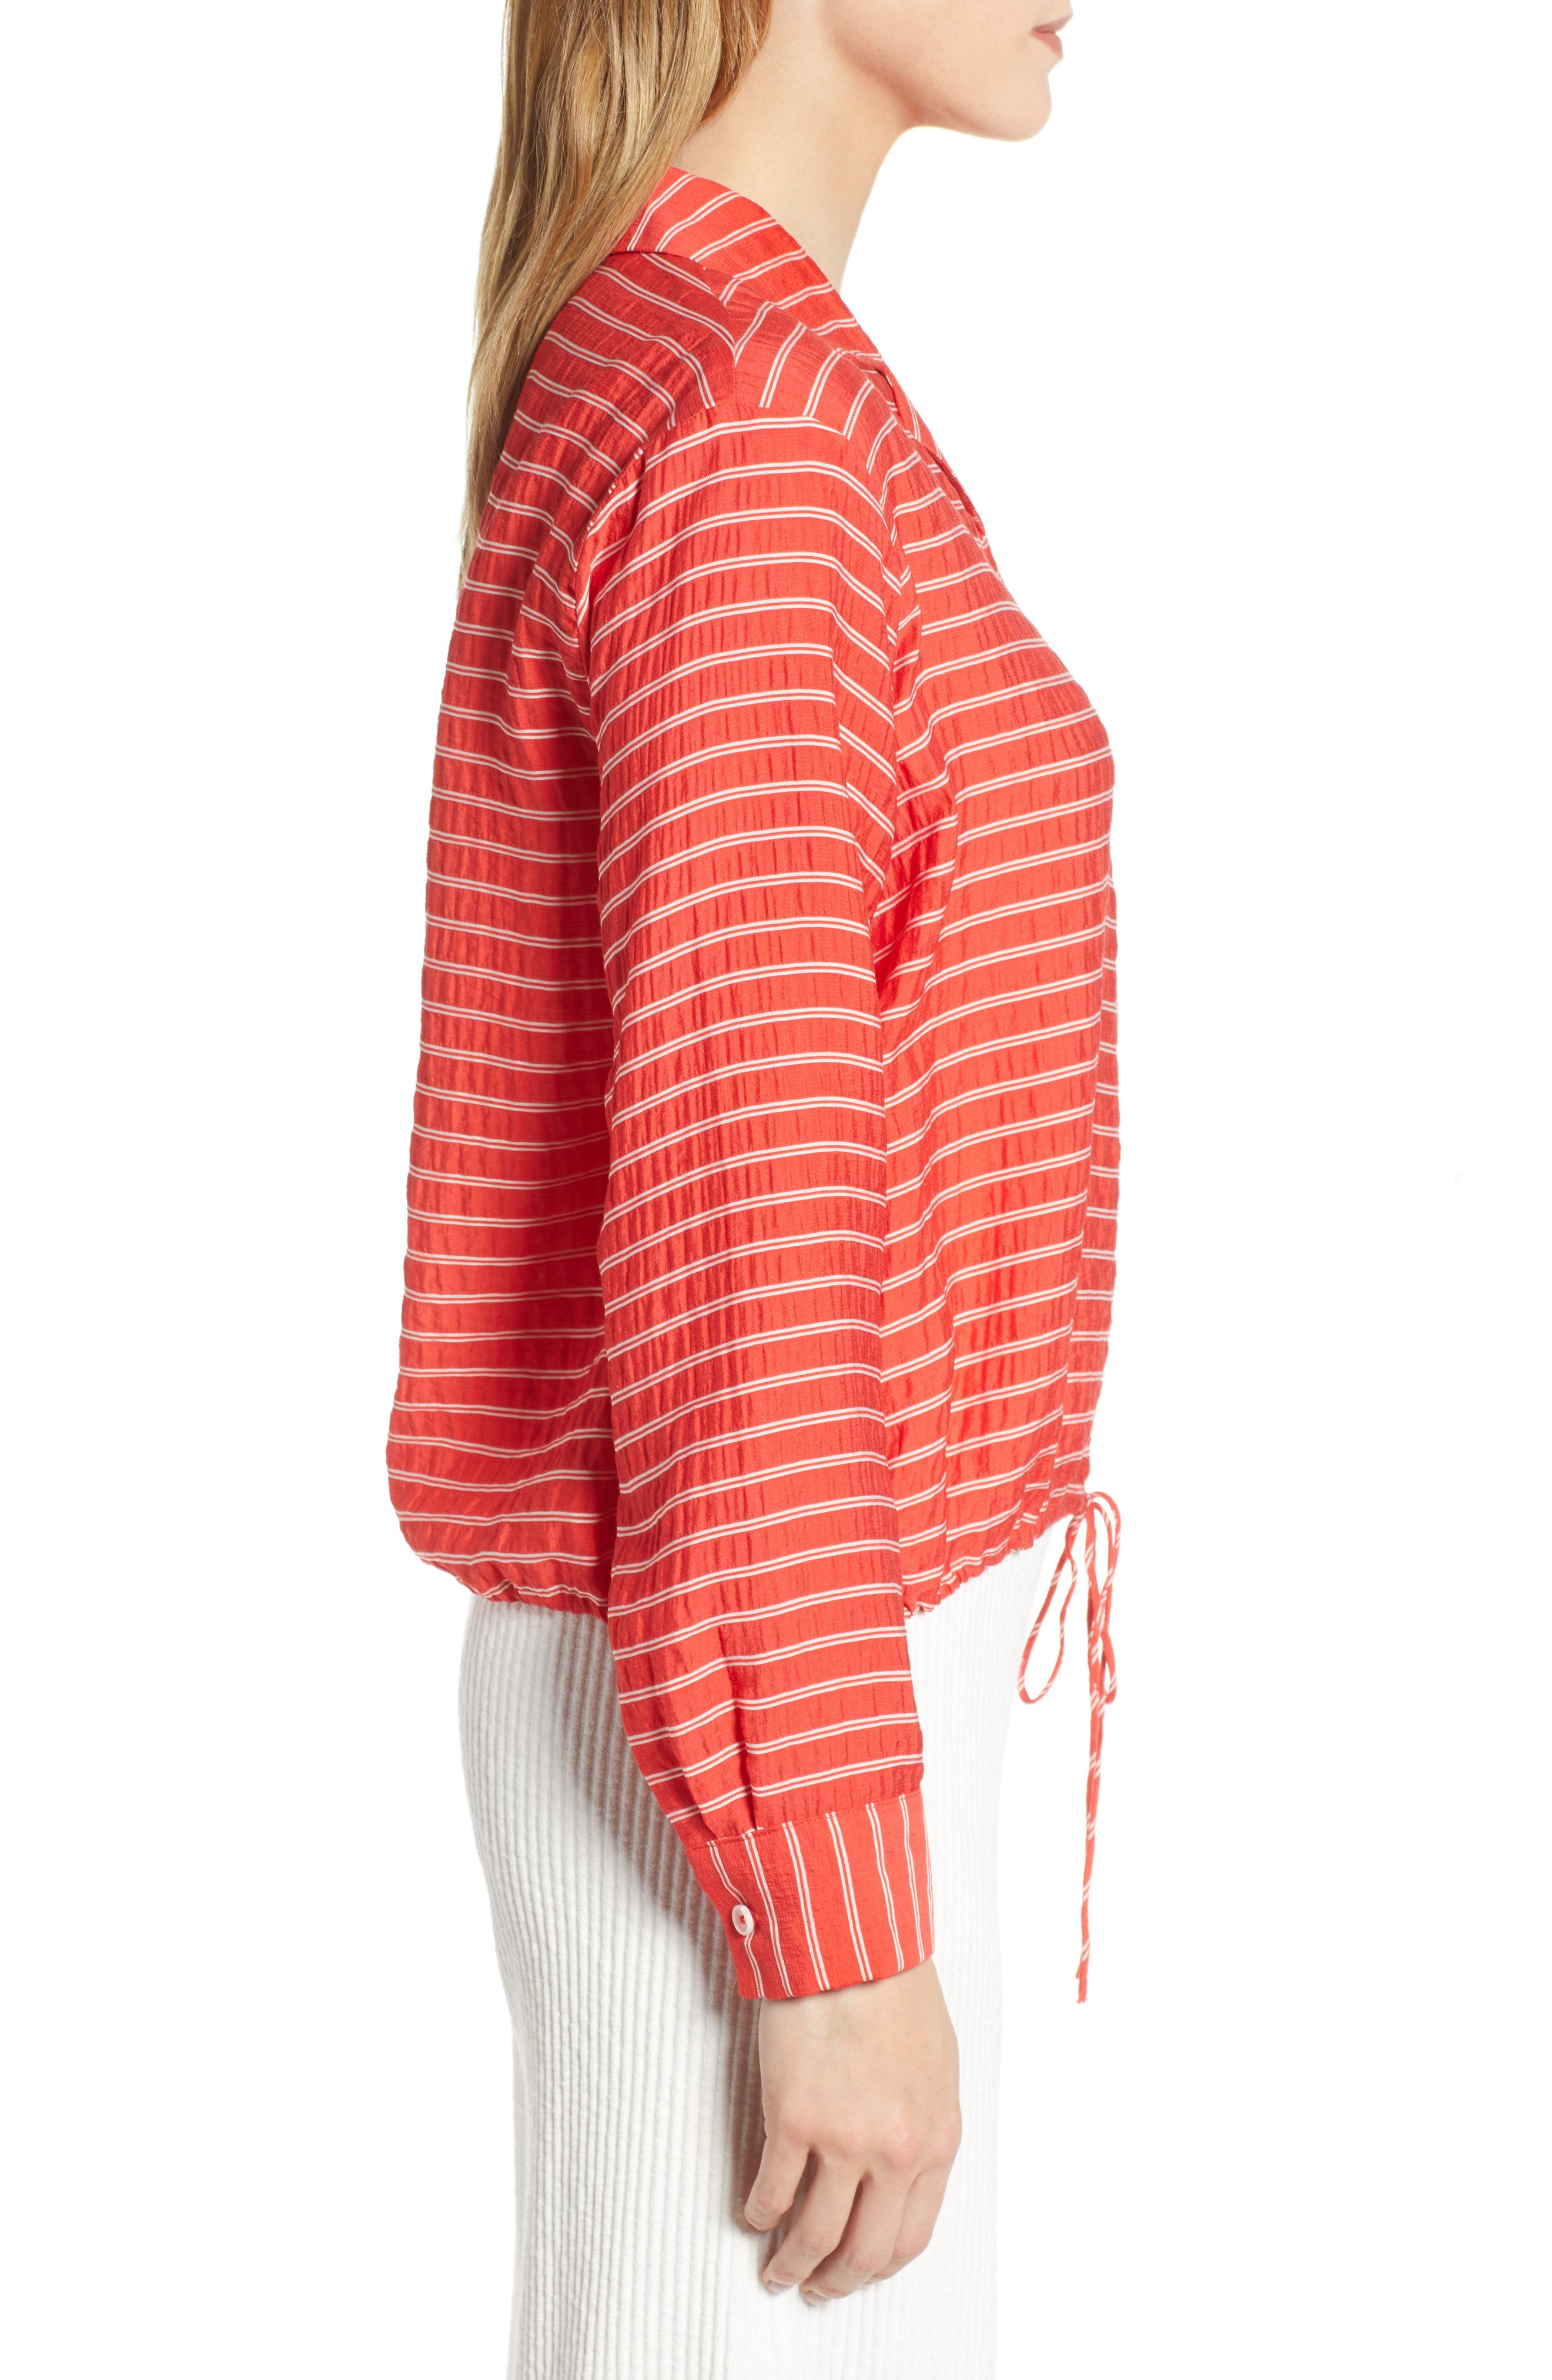 LOU & GREY, Sunny Stripe Drawstring Waist Blouse, Alternate thumbnail 3, color, 600